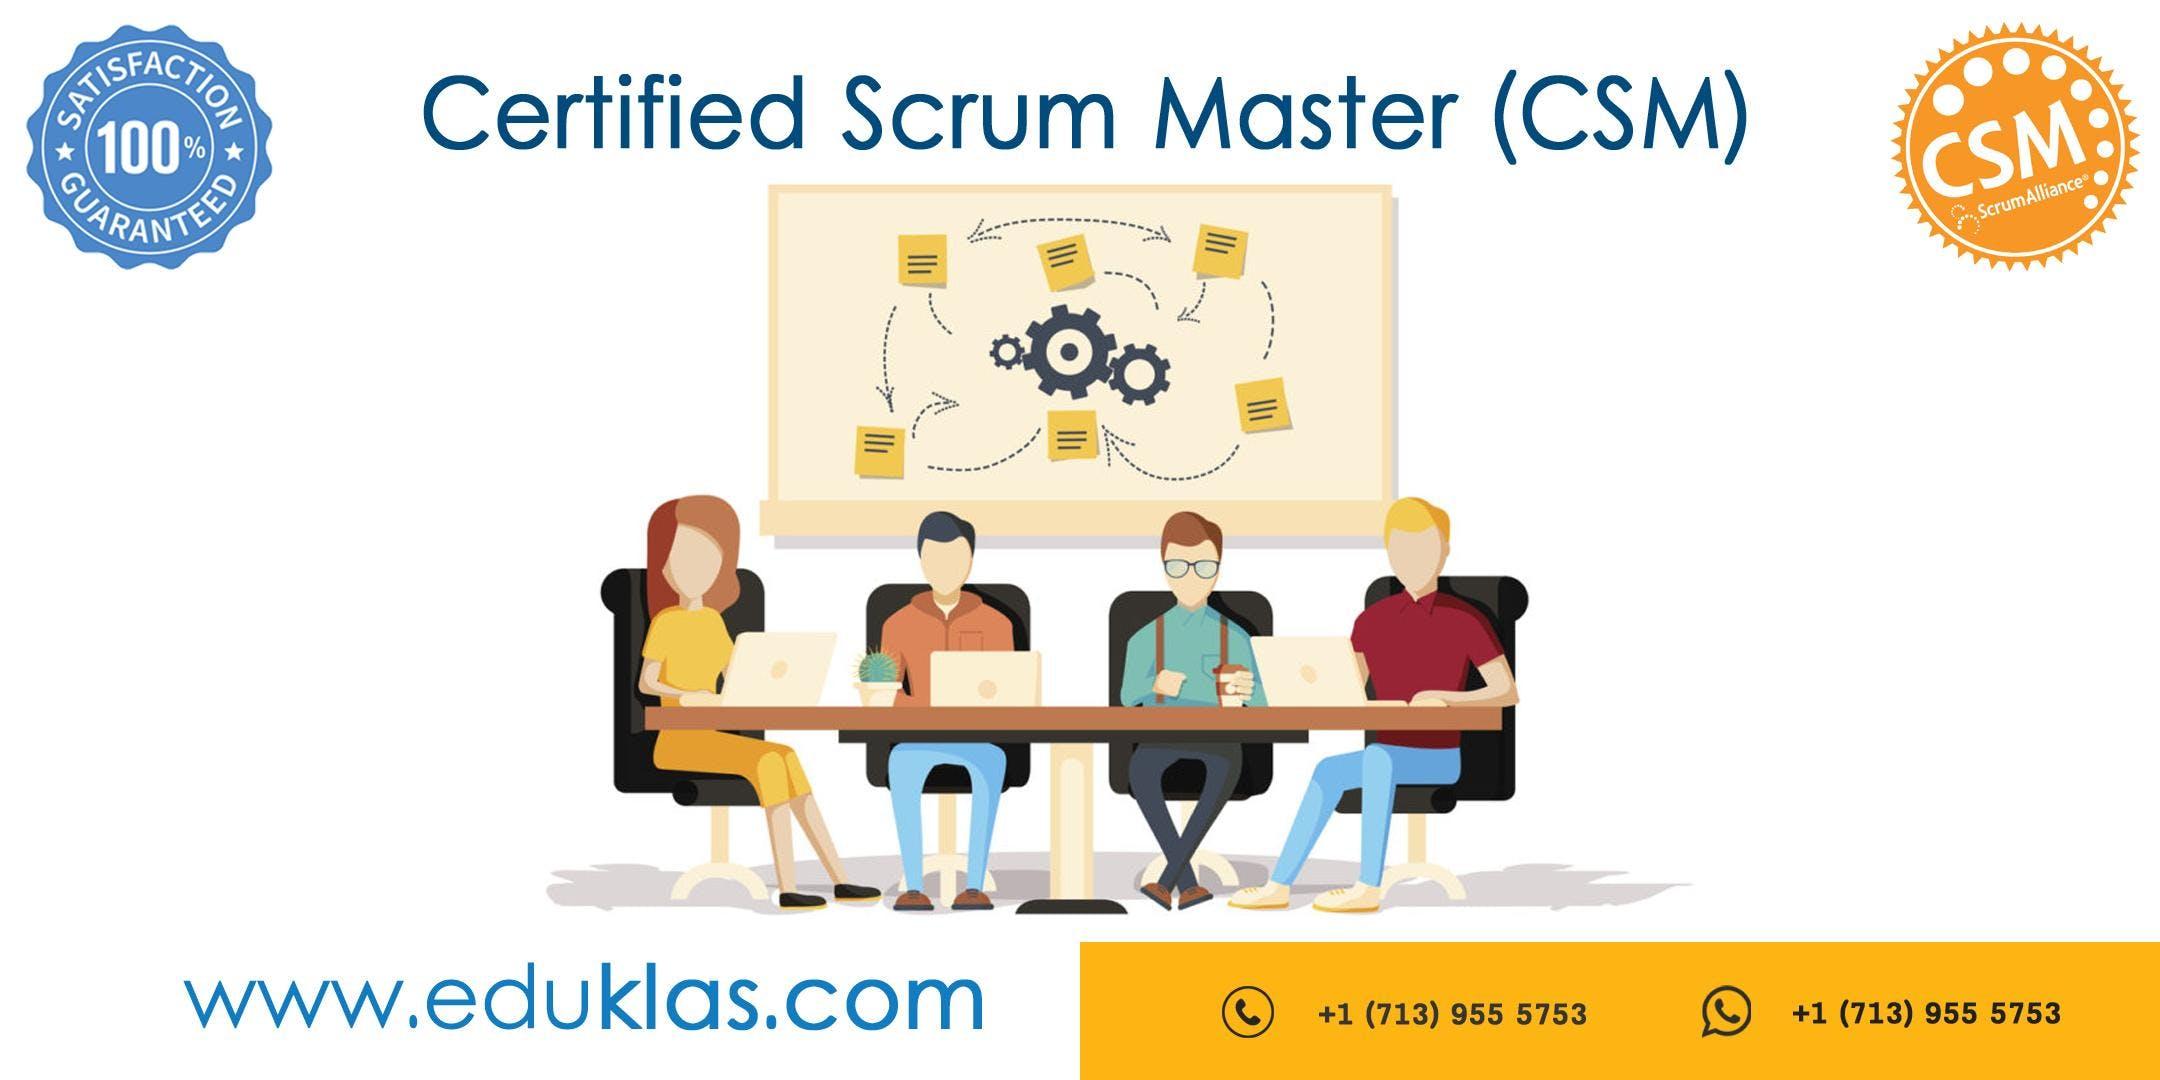 Scrum Master Certification Csm Training Csm Certification